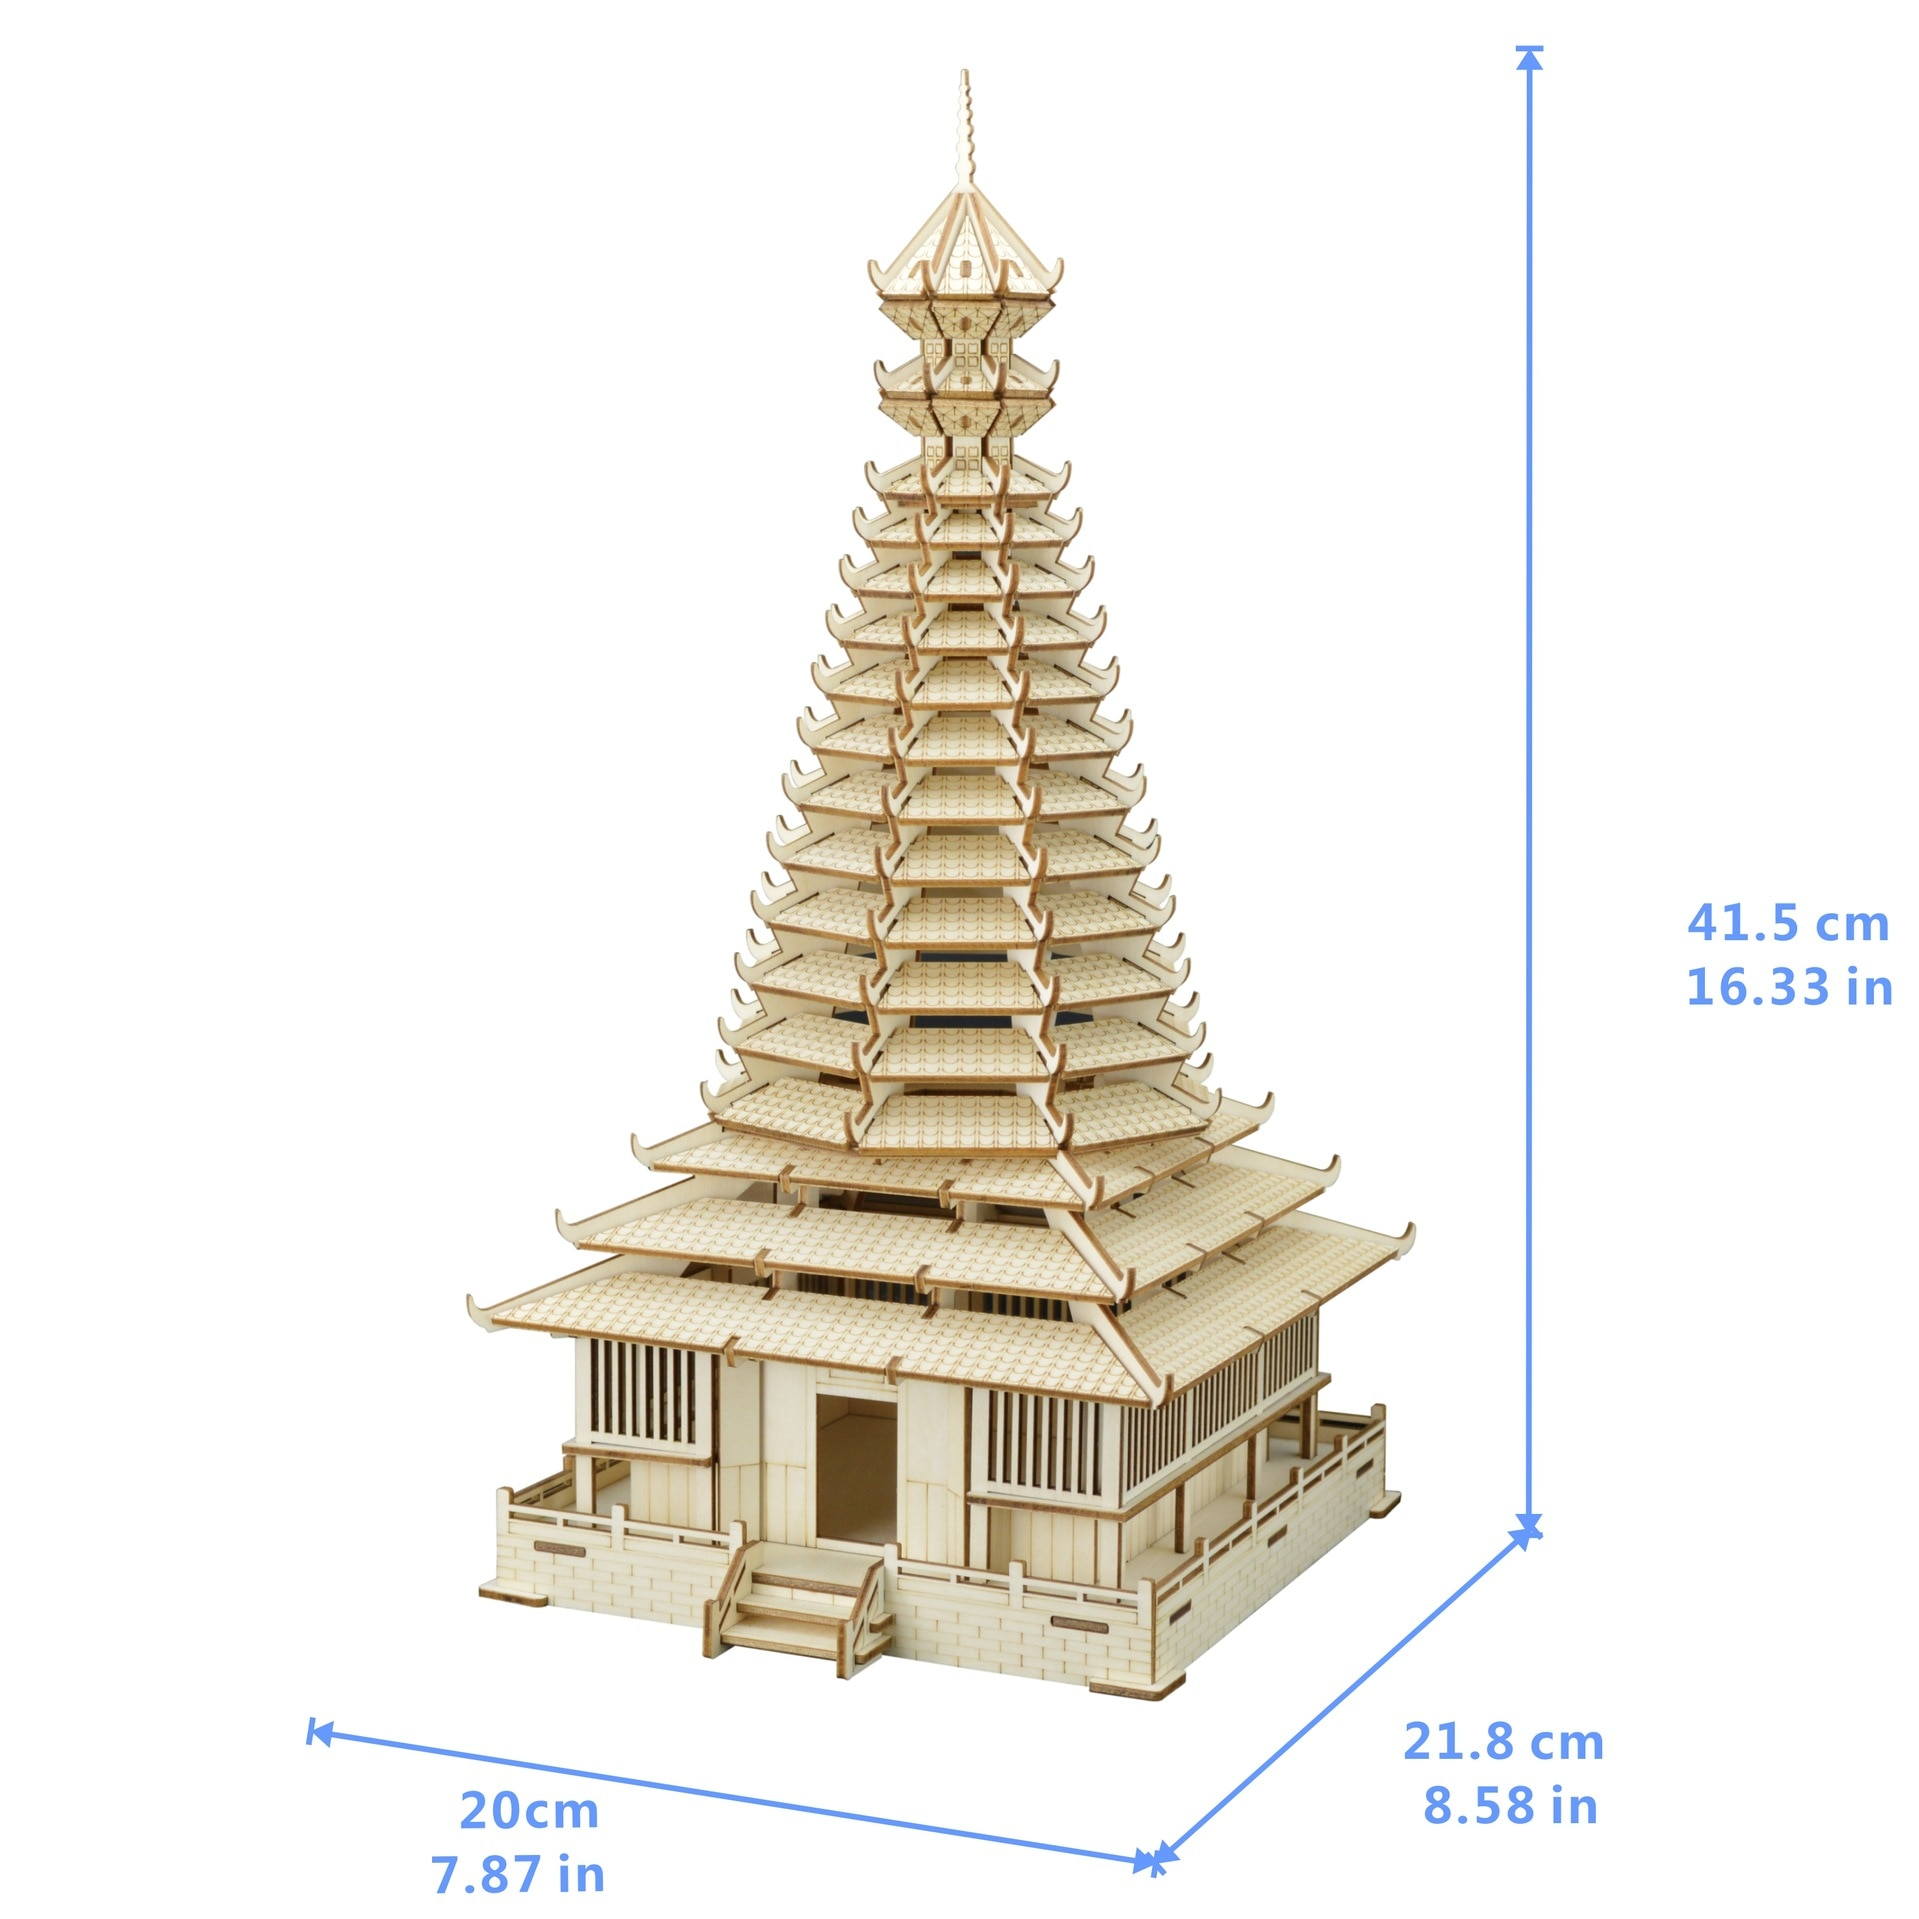 Kit de montaje de rompecabezas de madera en 3D DIY de torre de tambor de sanzhou para cortar juguetes de madera para regalo de Navidad 3197